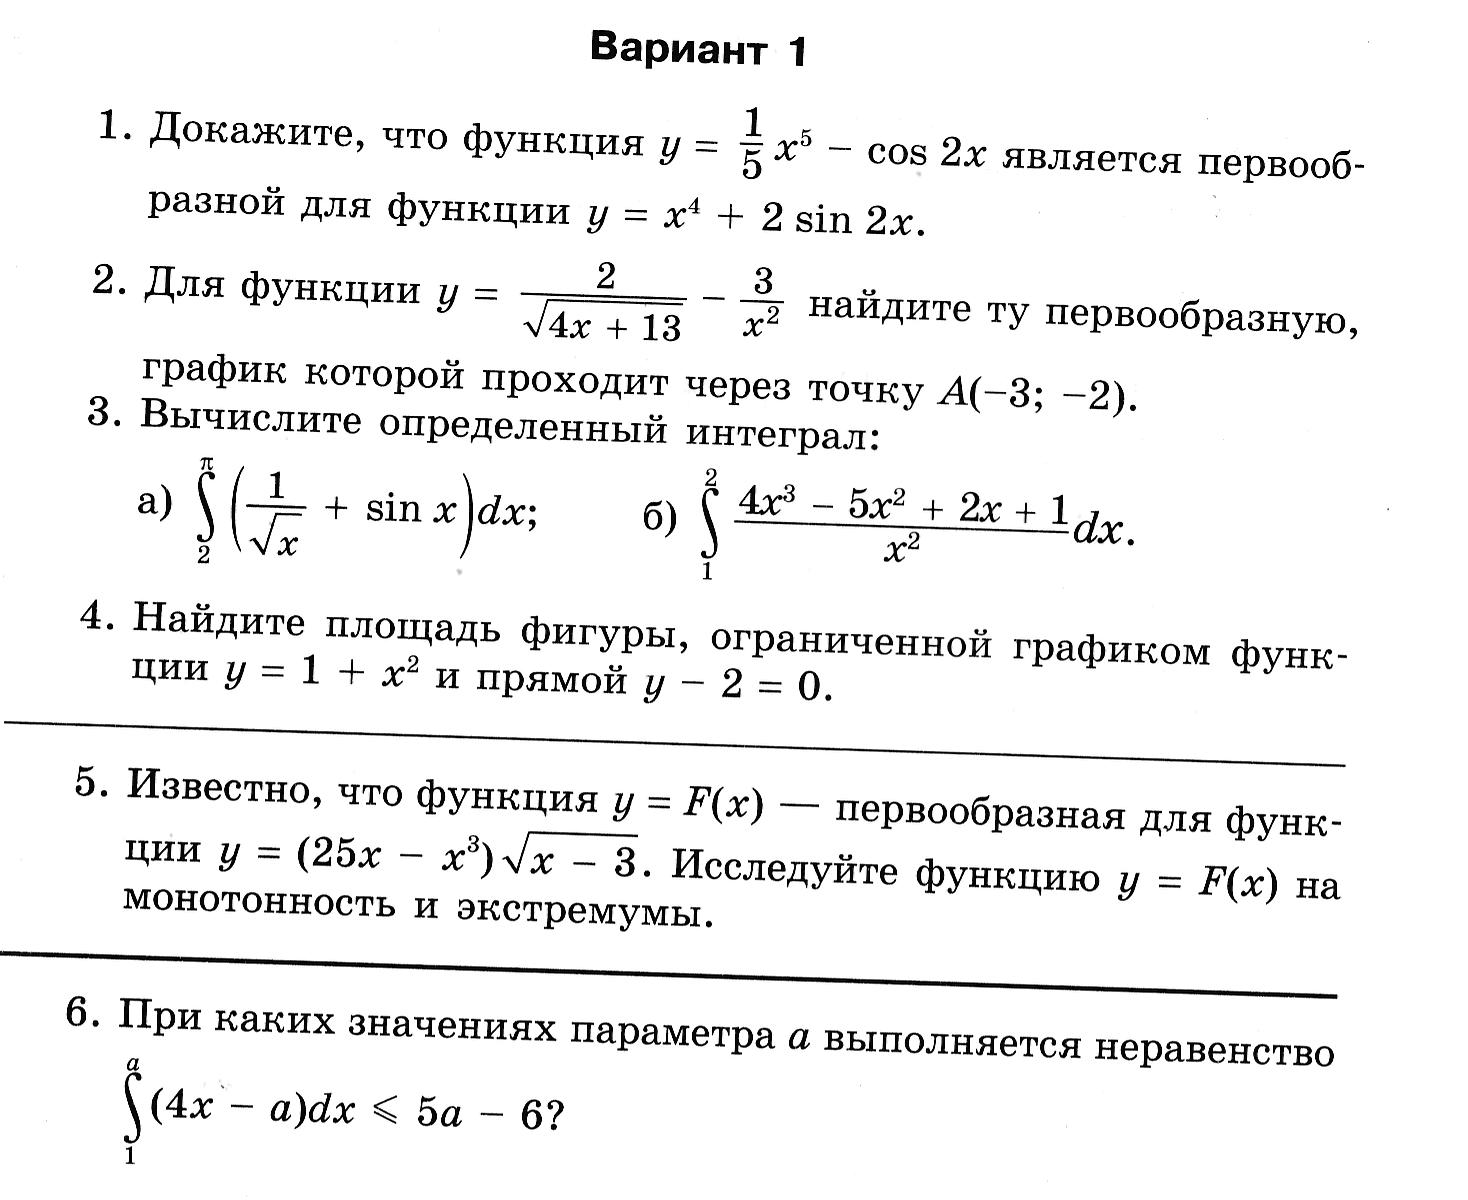 РАБОЧАЯ ПРОГРАММА по алгебре и началам анализа класс  hello html m1ee36a44 png